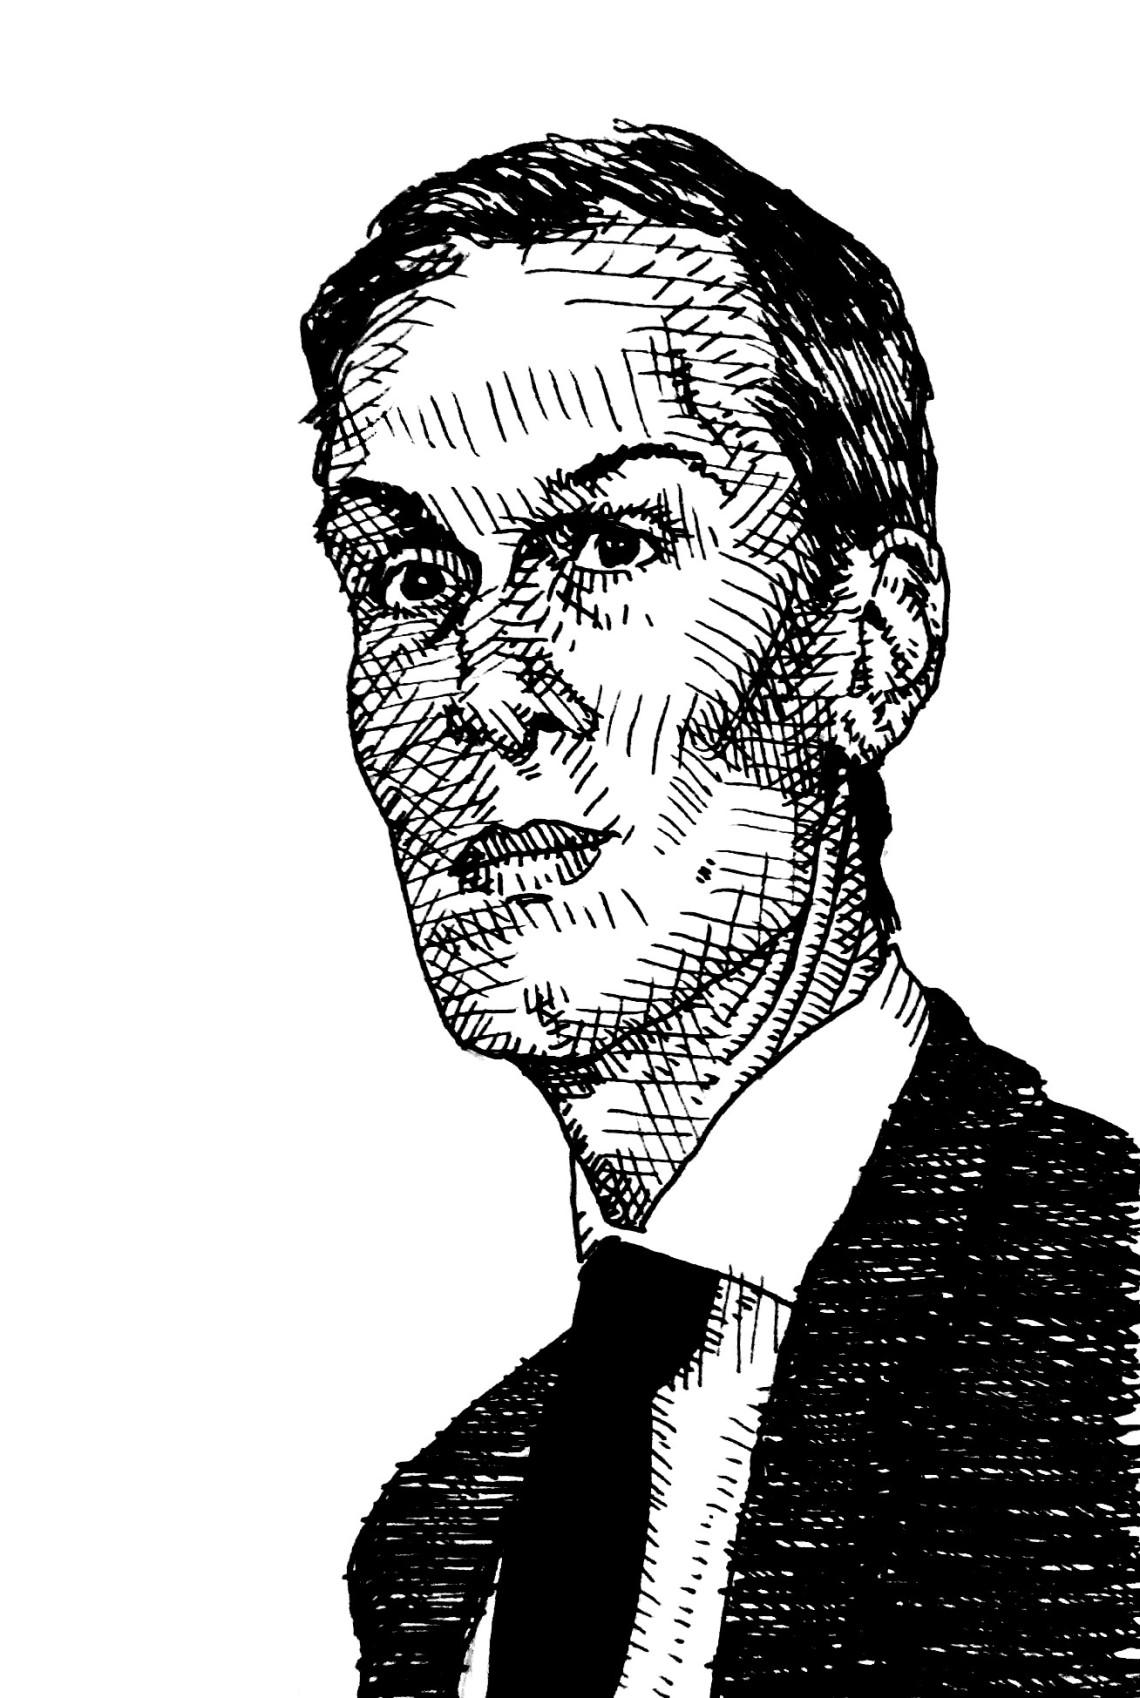 Jared Kushner illustration